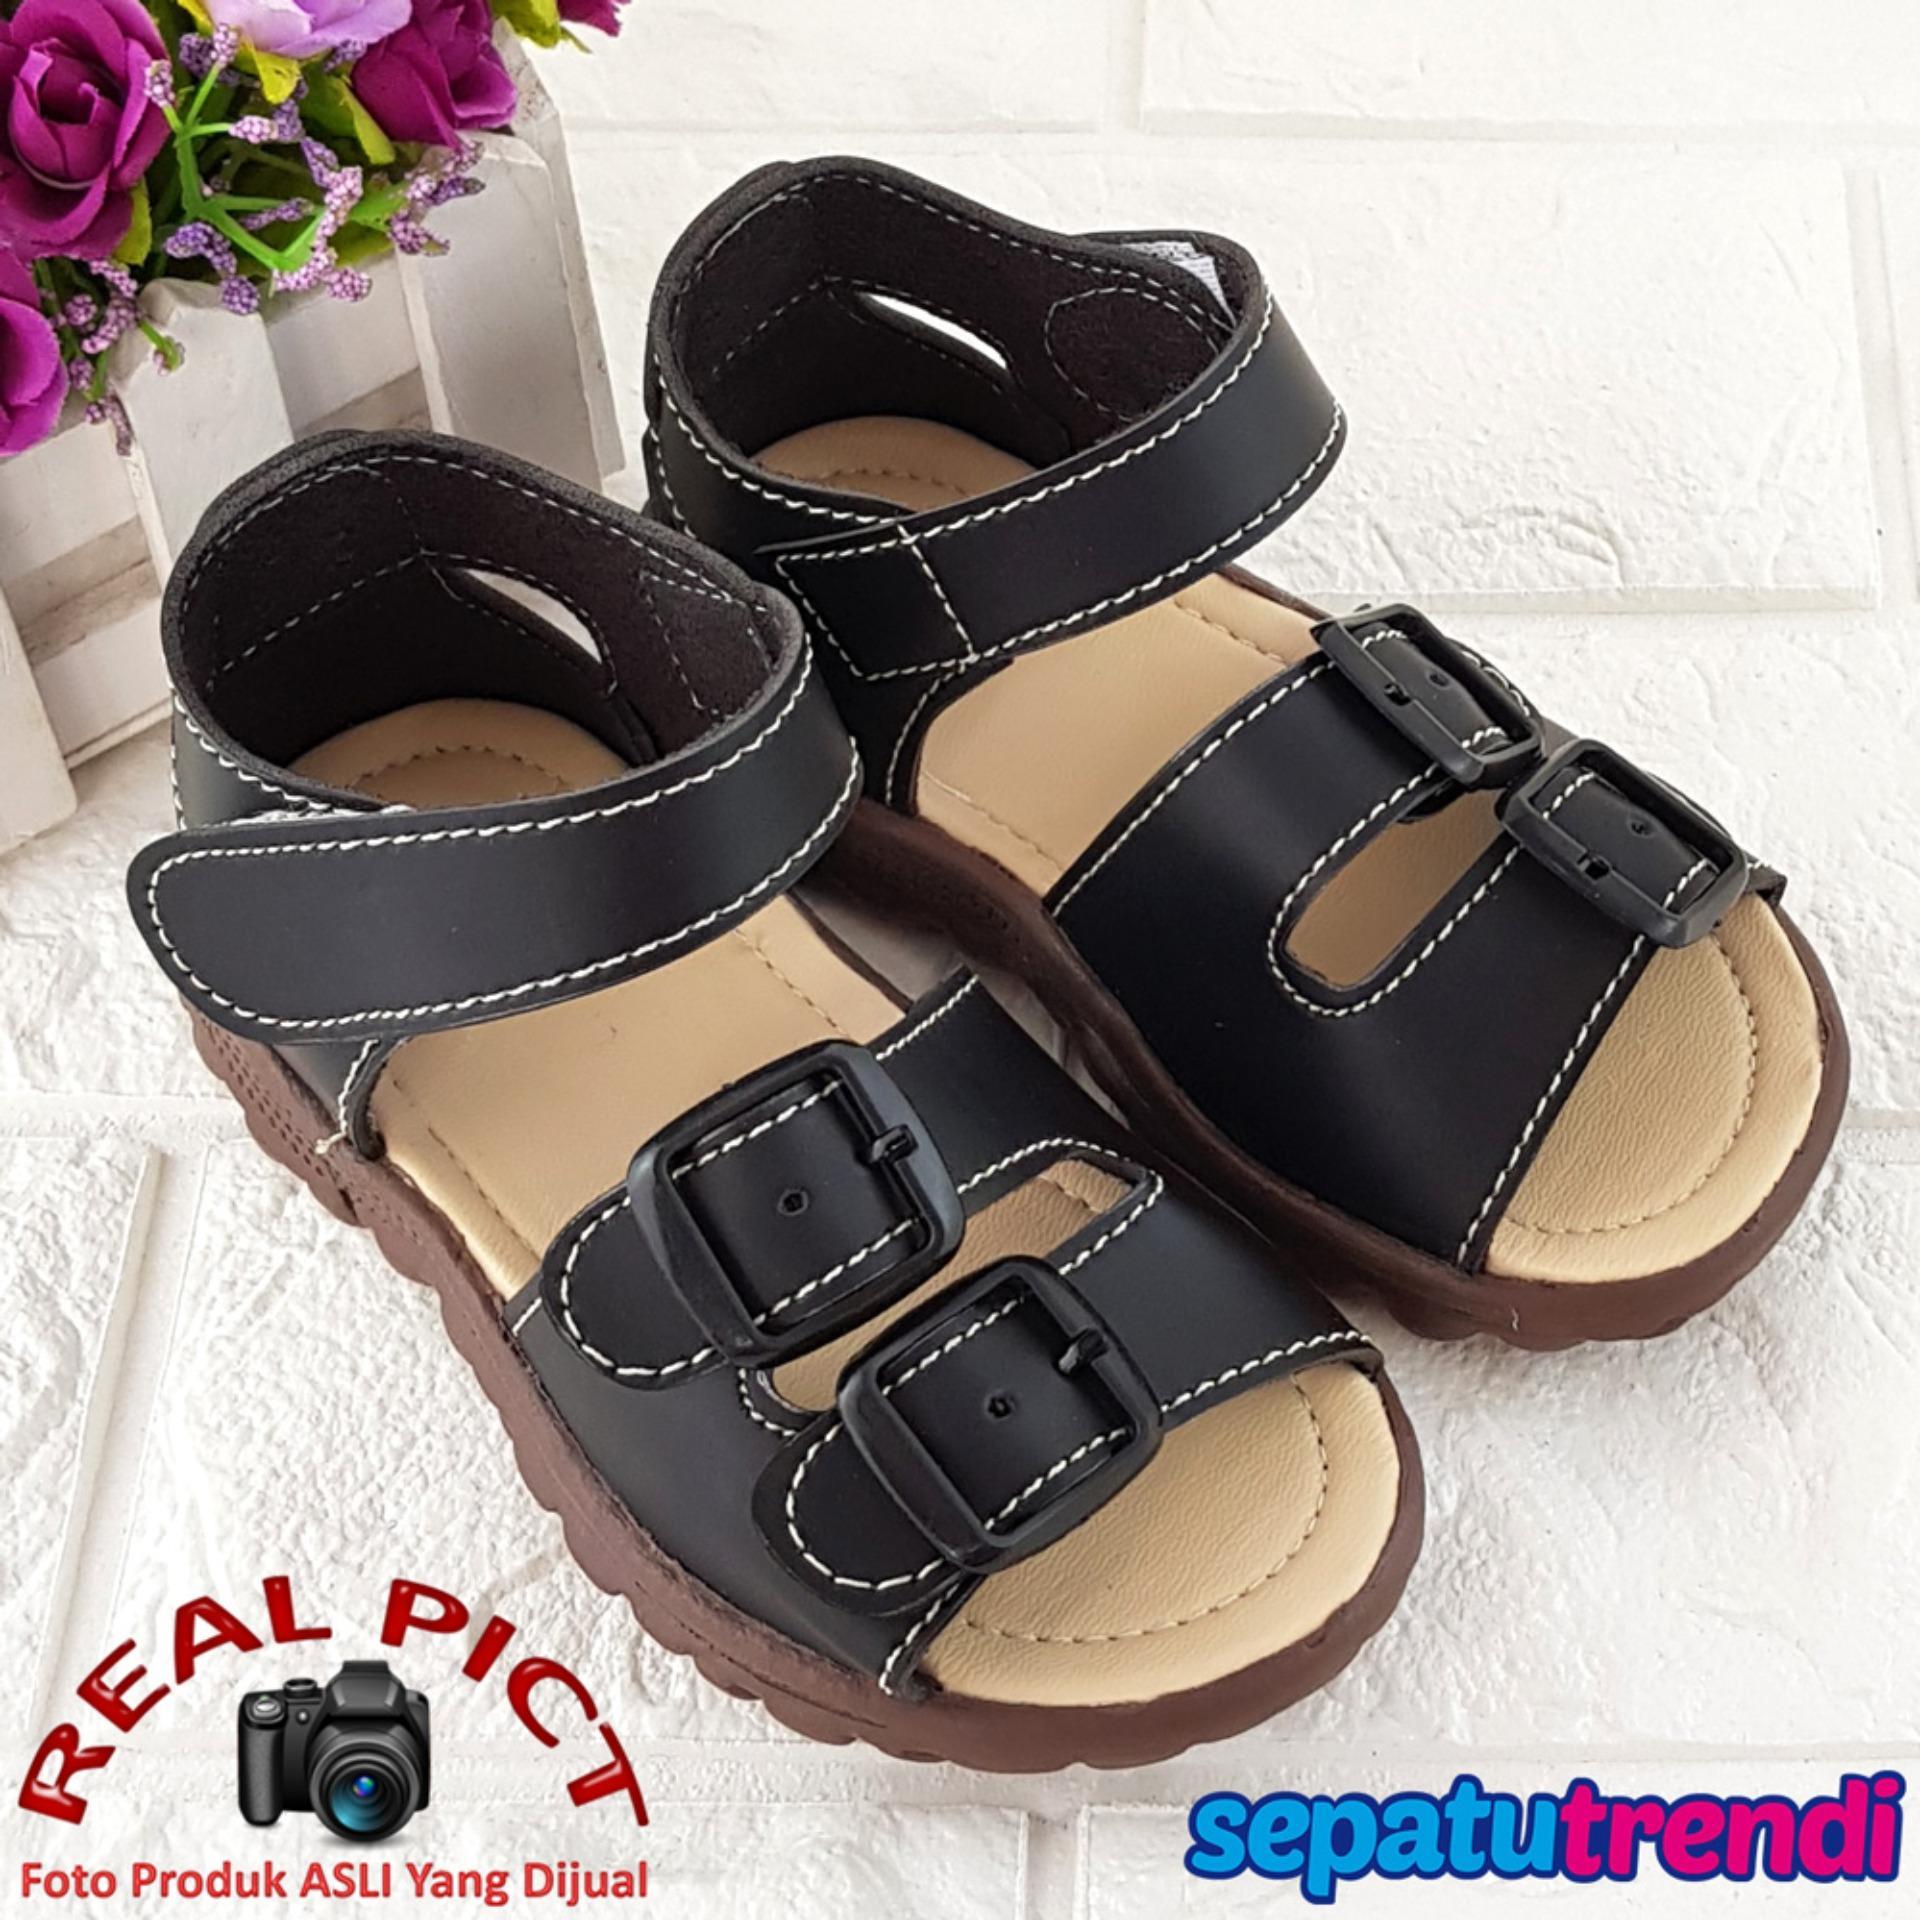 Trendi Sepatu Sandal Anak Laki Laki Batita Gsp2 Trendi Diskon 50